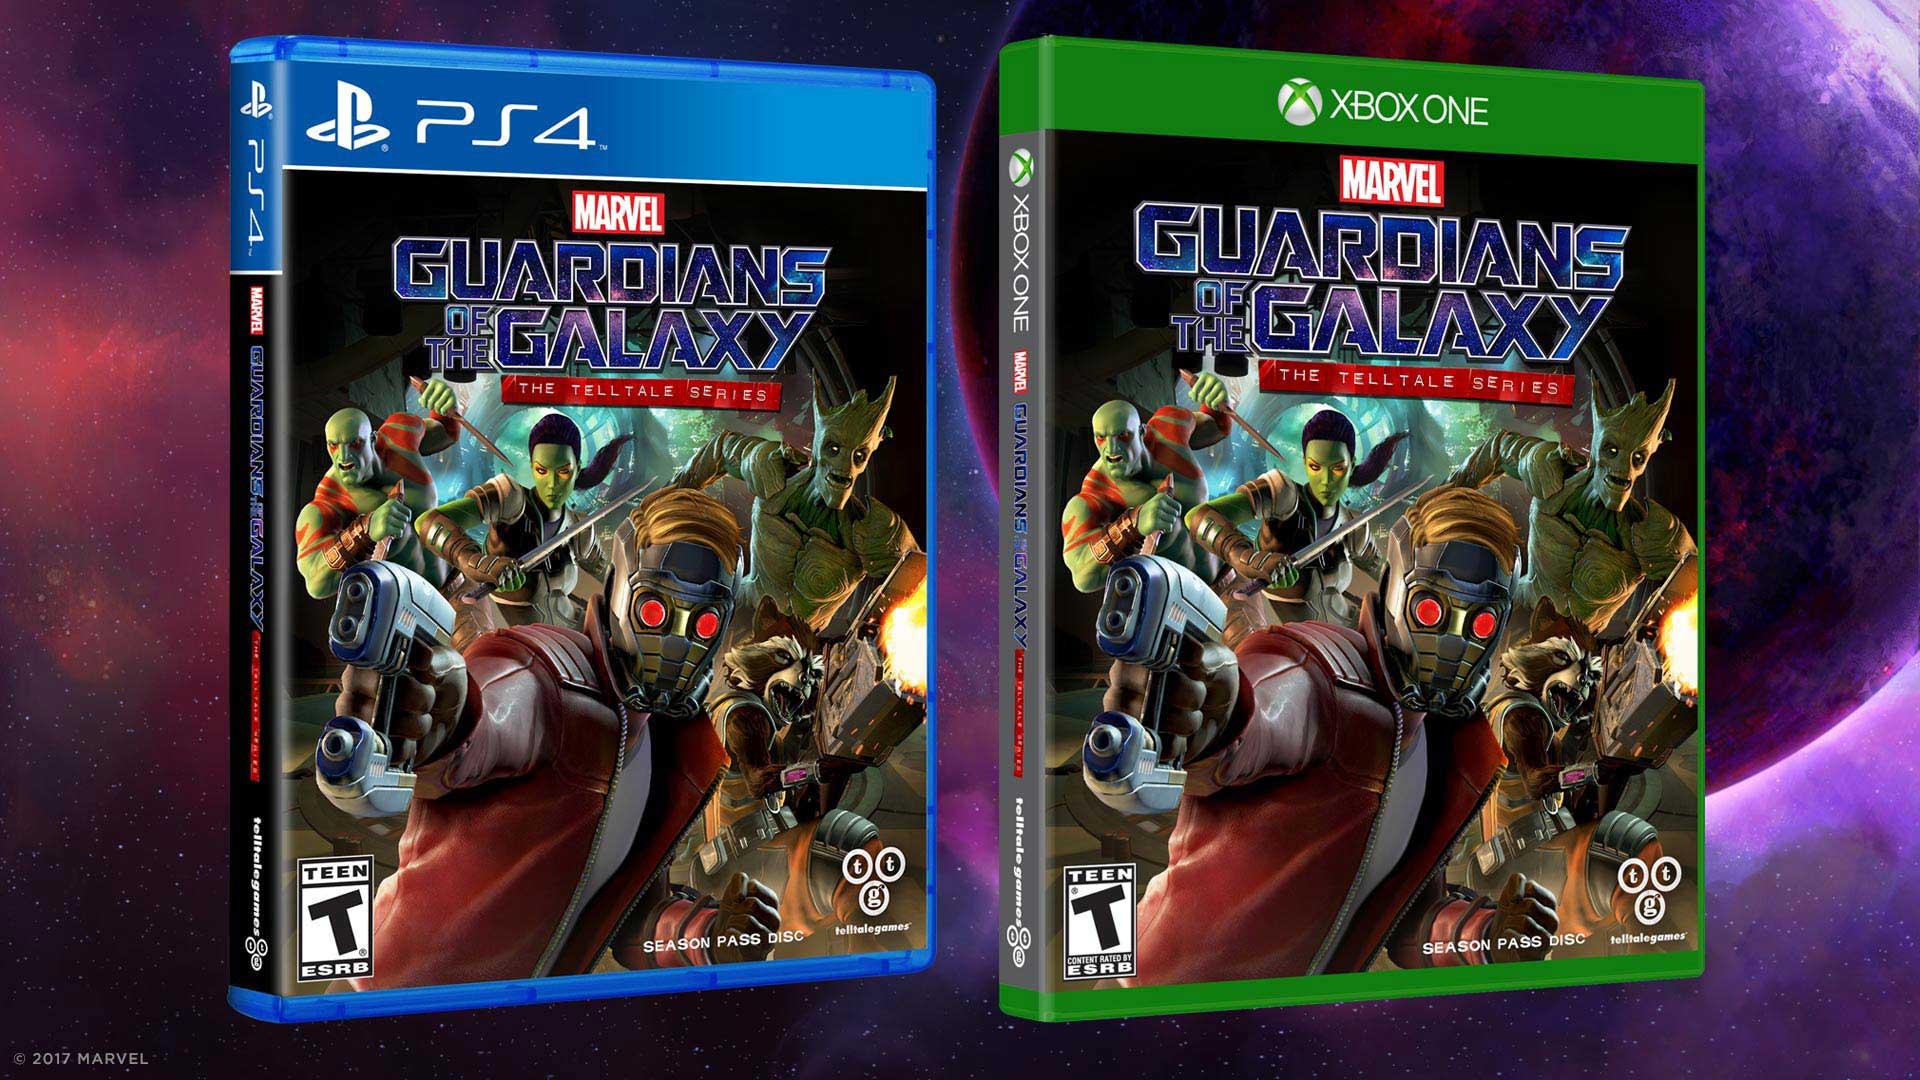 Guardians of the Galaxy od Telltale Games v prvním traileru 141190